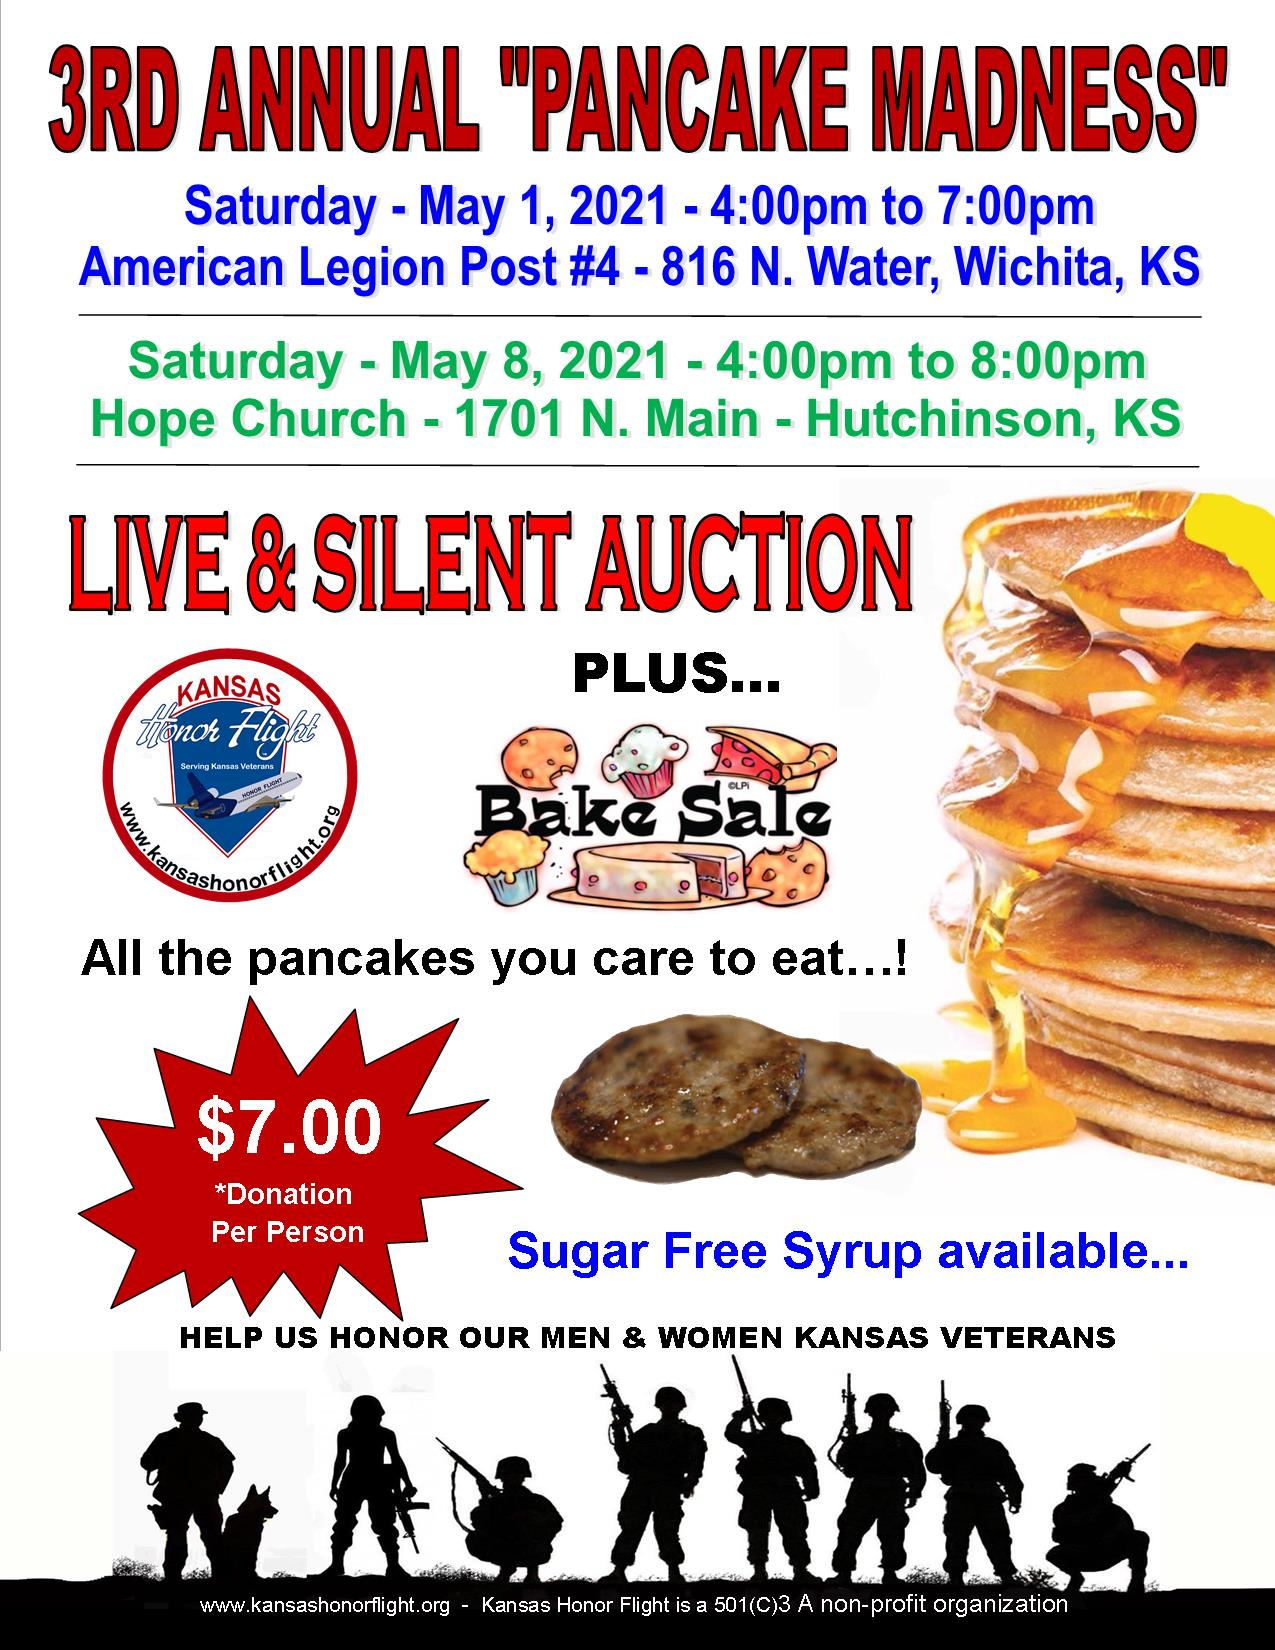 3rd Annual 'Pancake Madness'